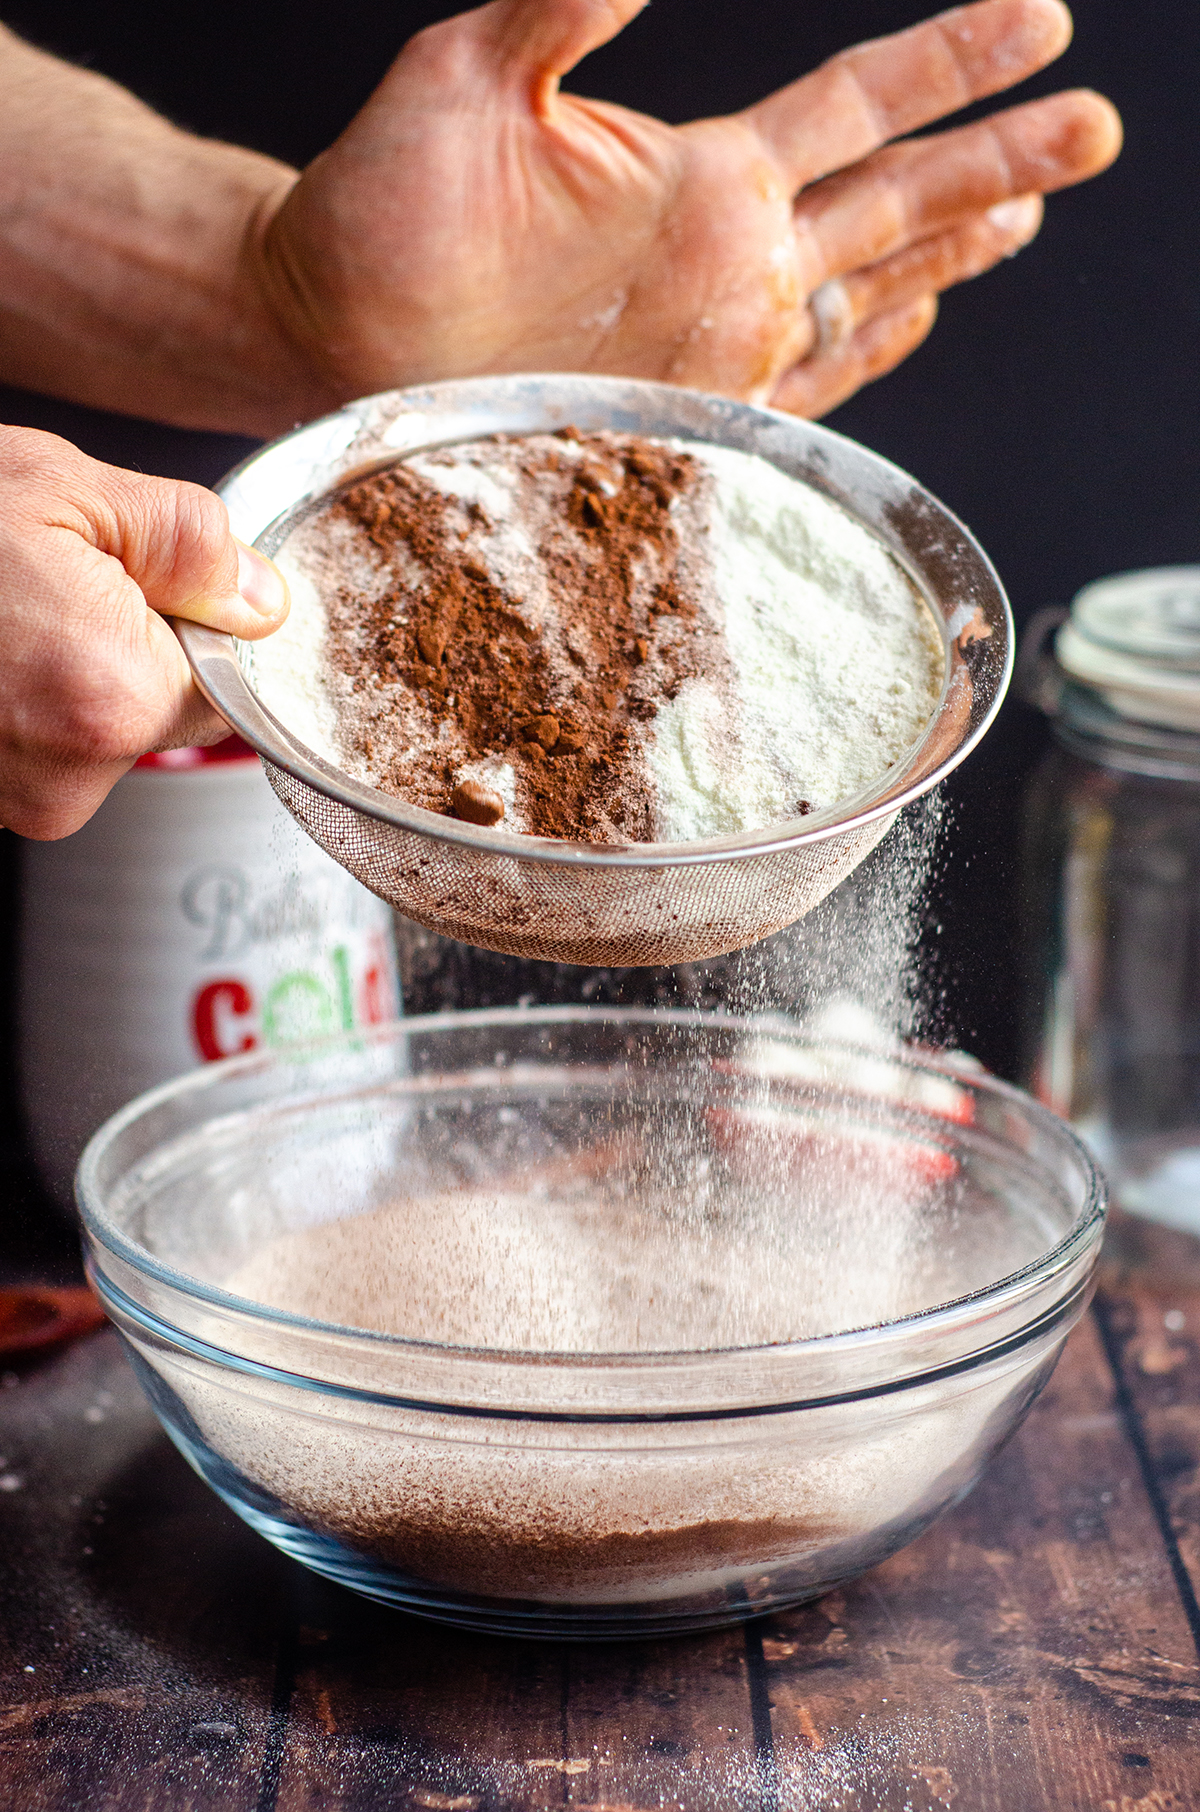 sifting powdered sugar and cocoa powder into a bowl for homemade hot cocoa mix